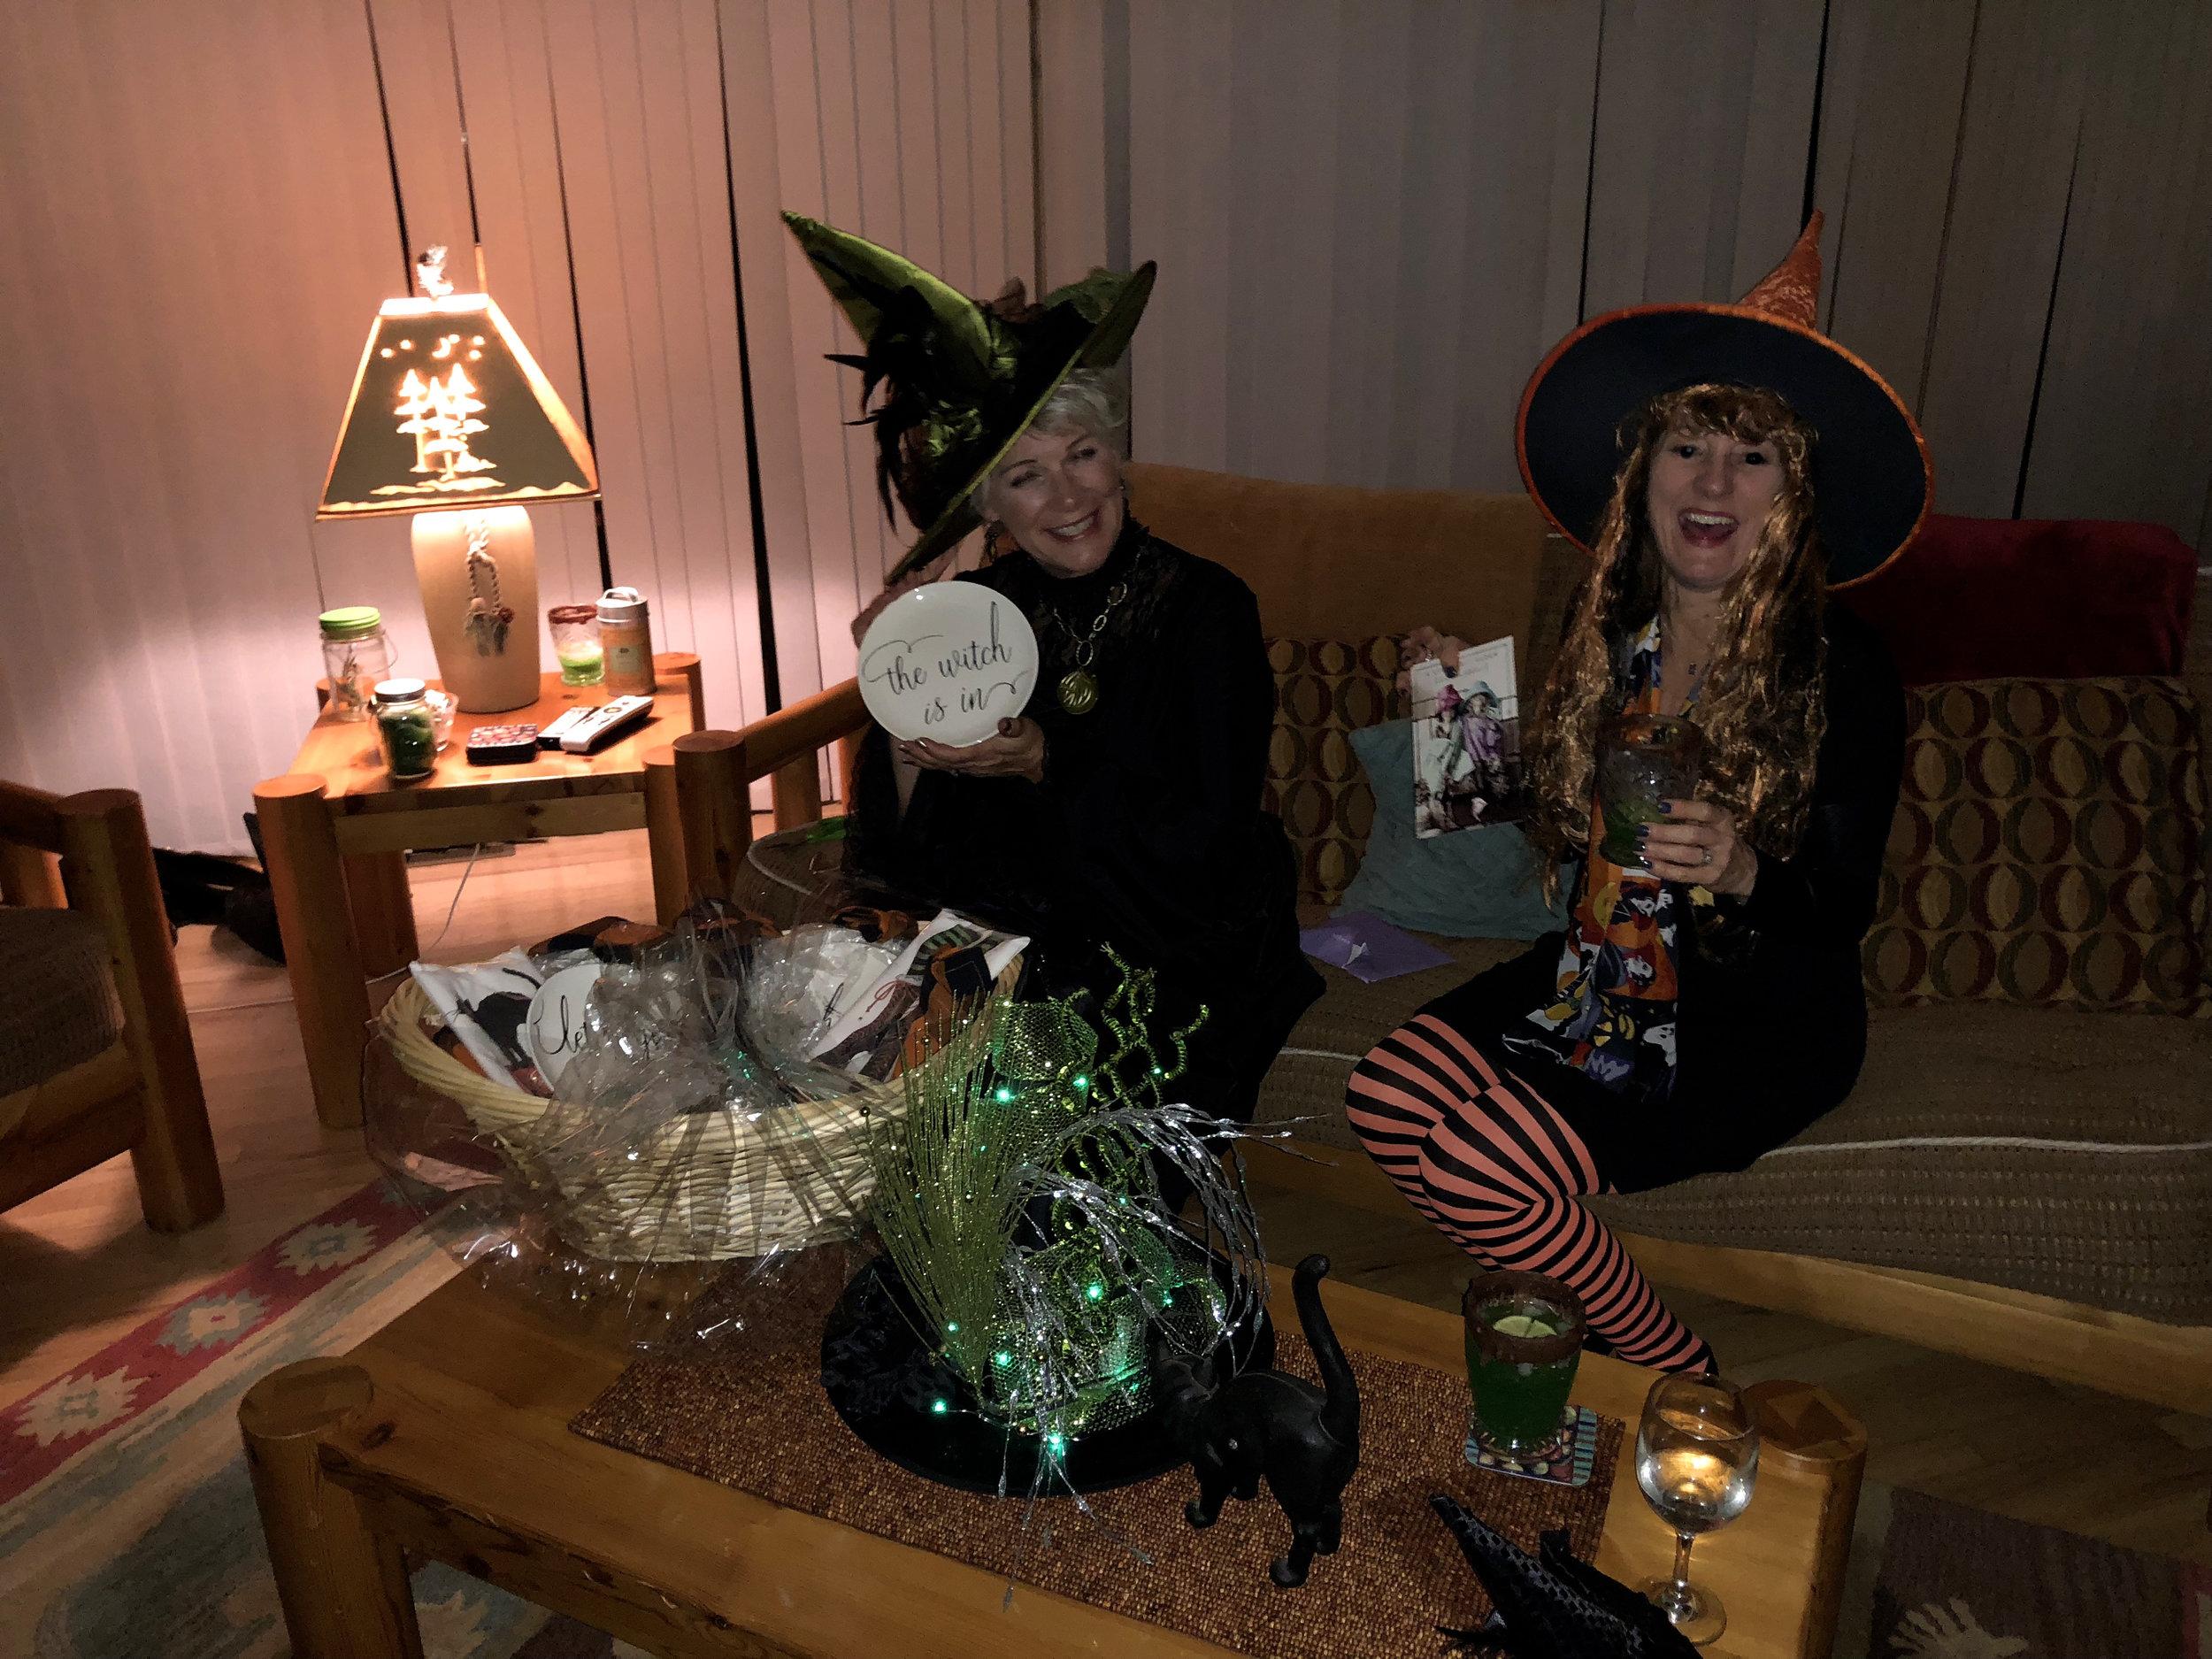 teri_w3bookclub_Wicked_halloween_spiritedtable_photo51.jpg